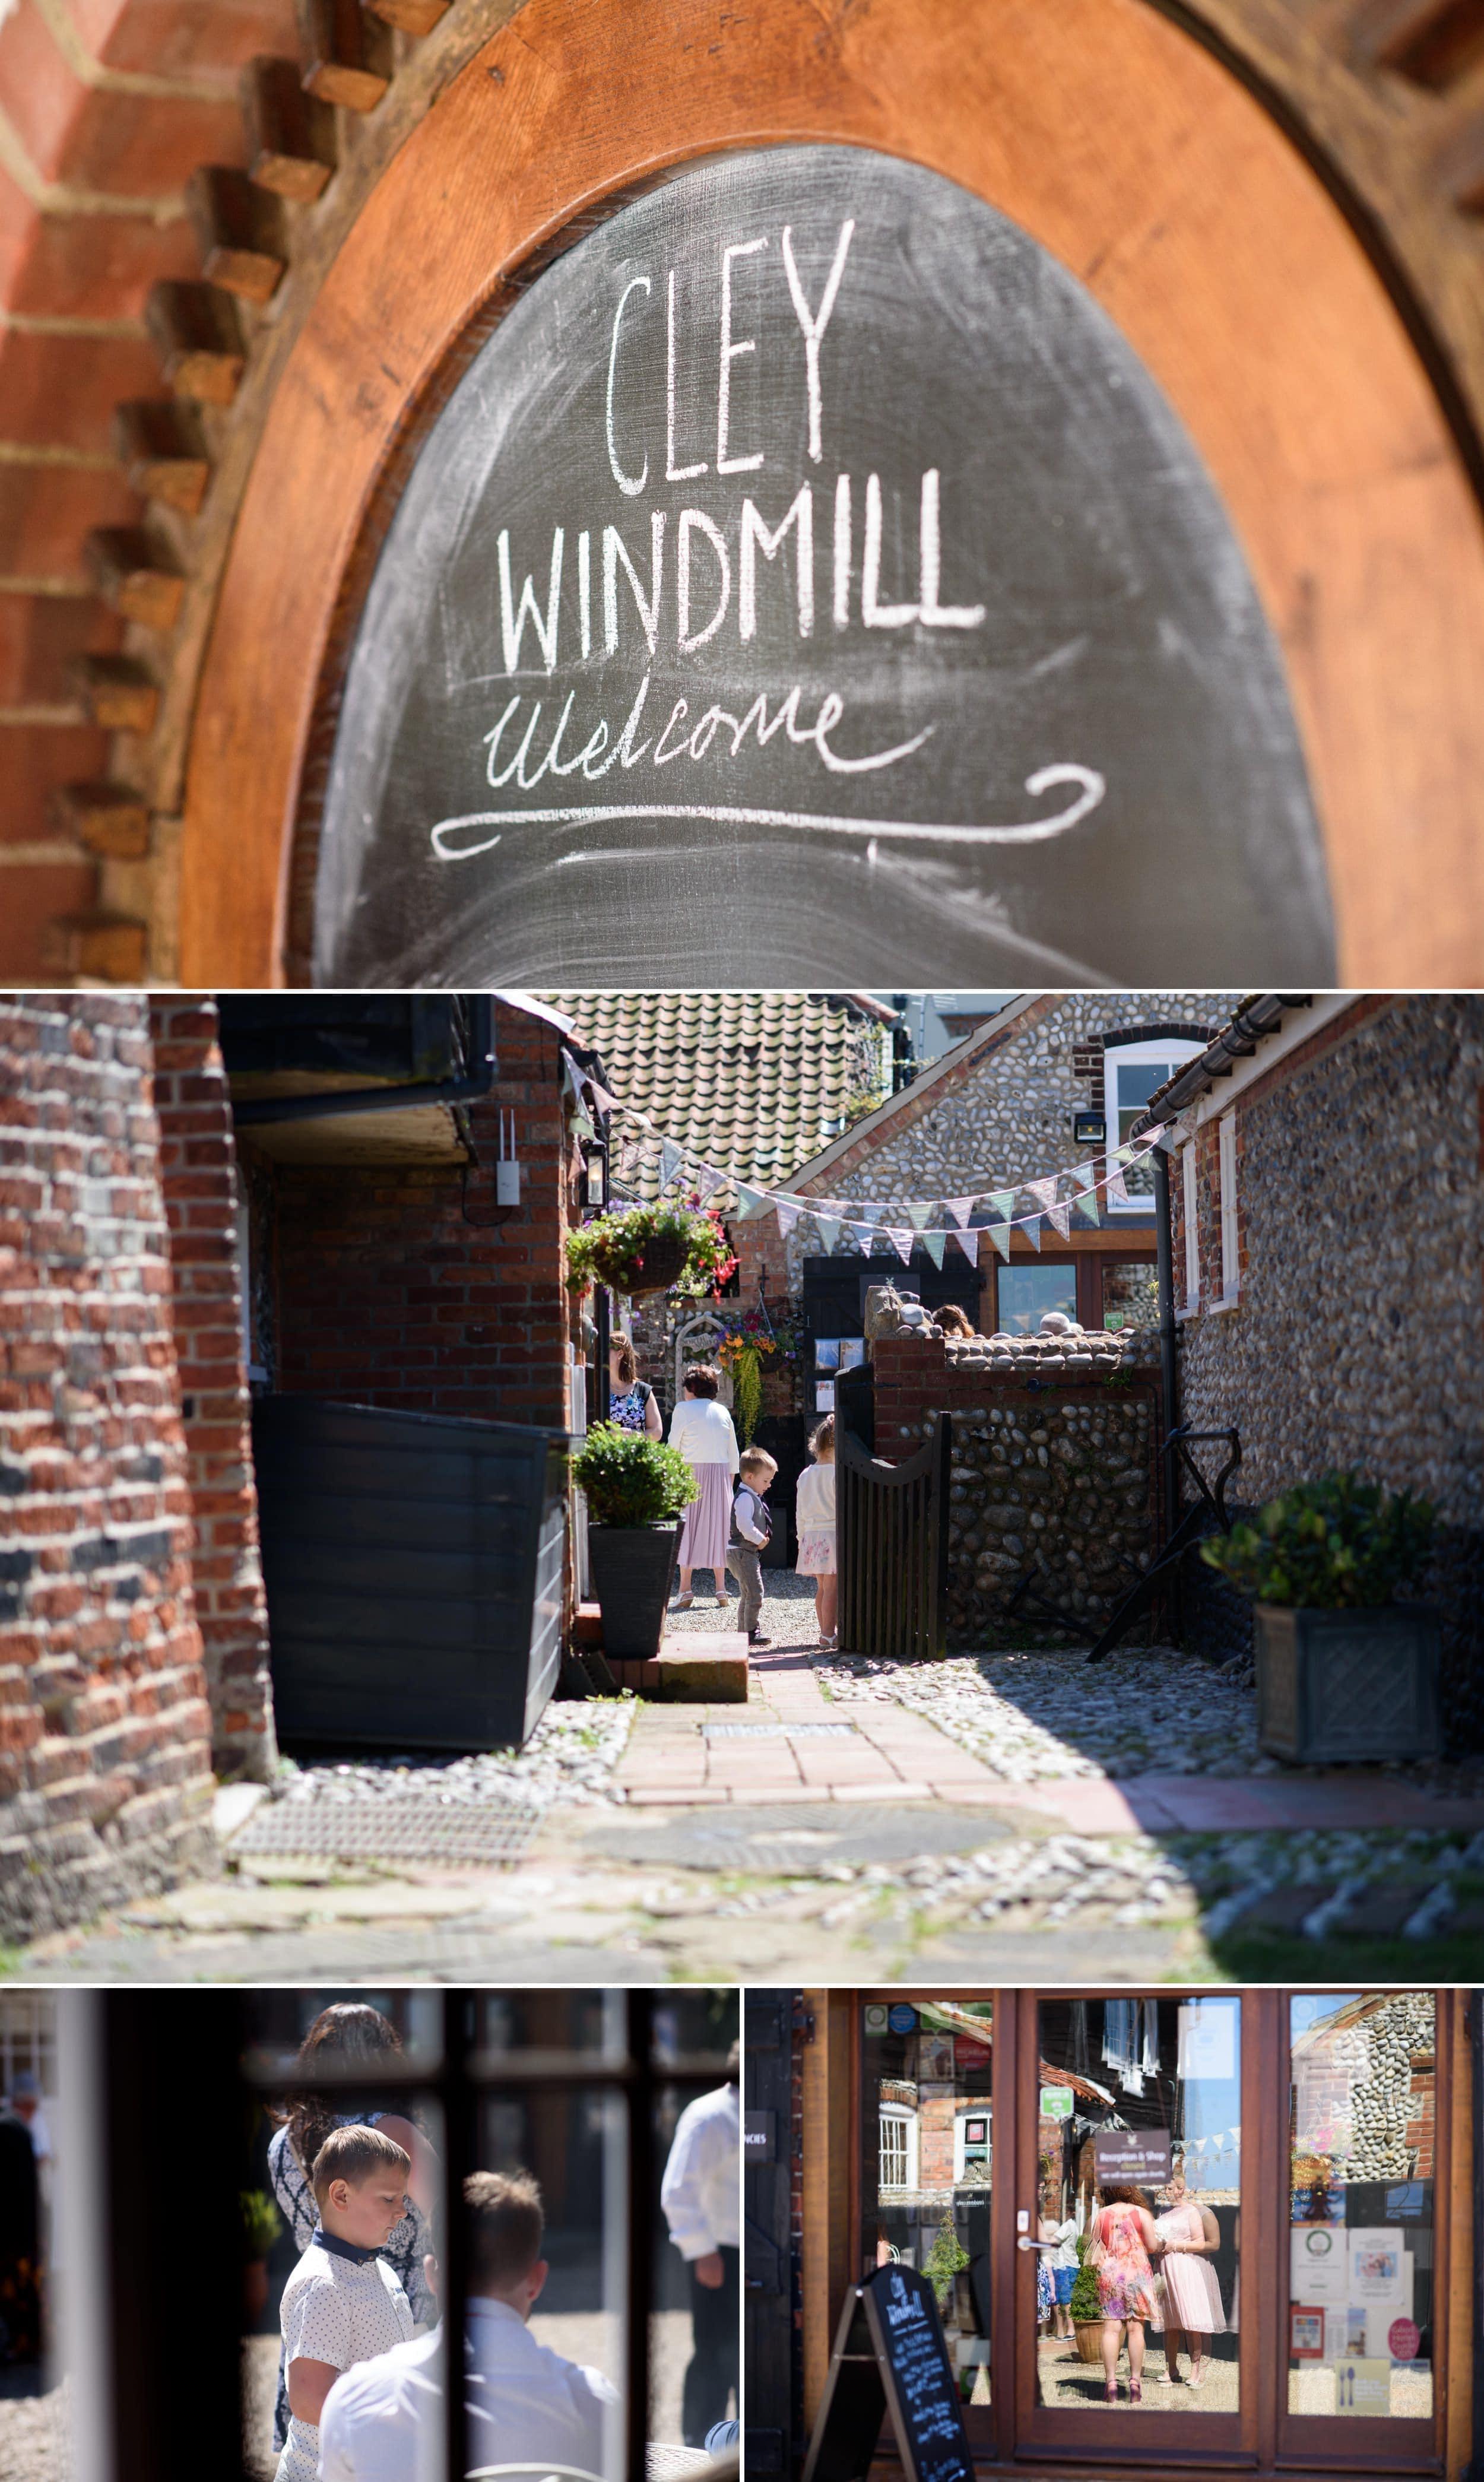 cley_windmill_norfolk_wedding_photography-3